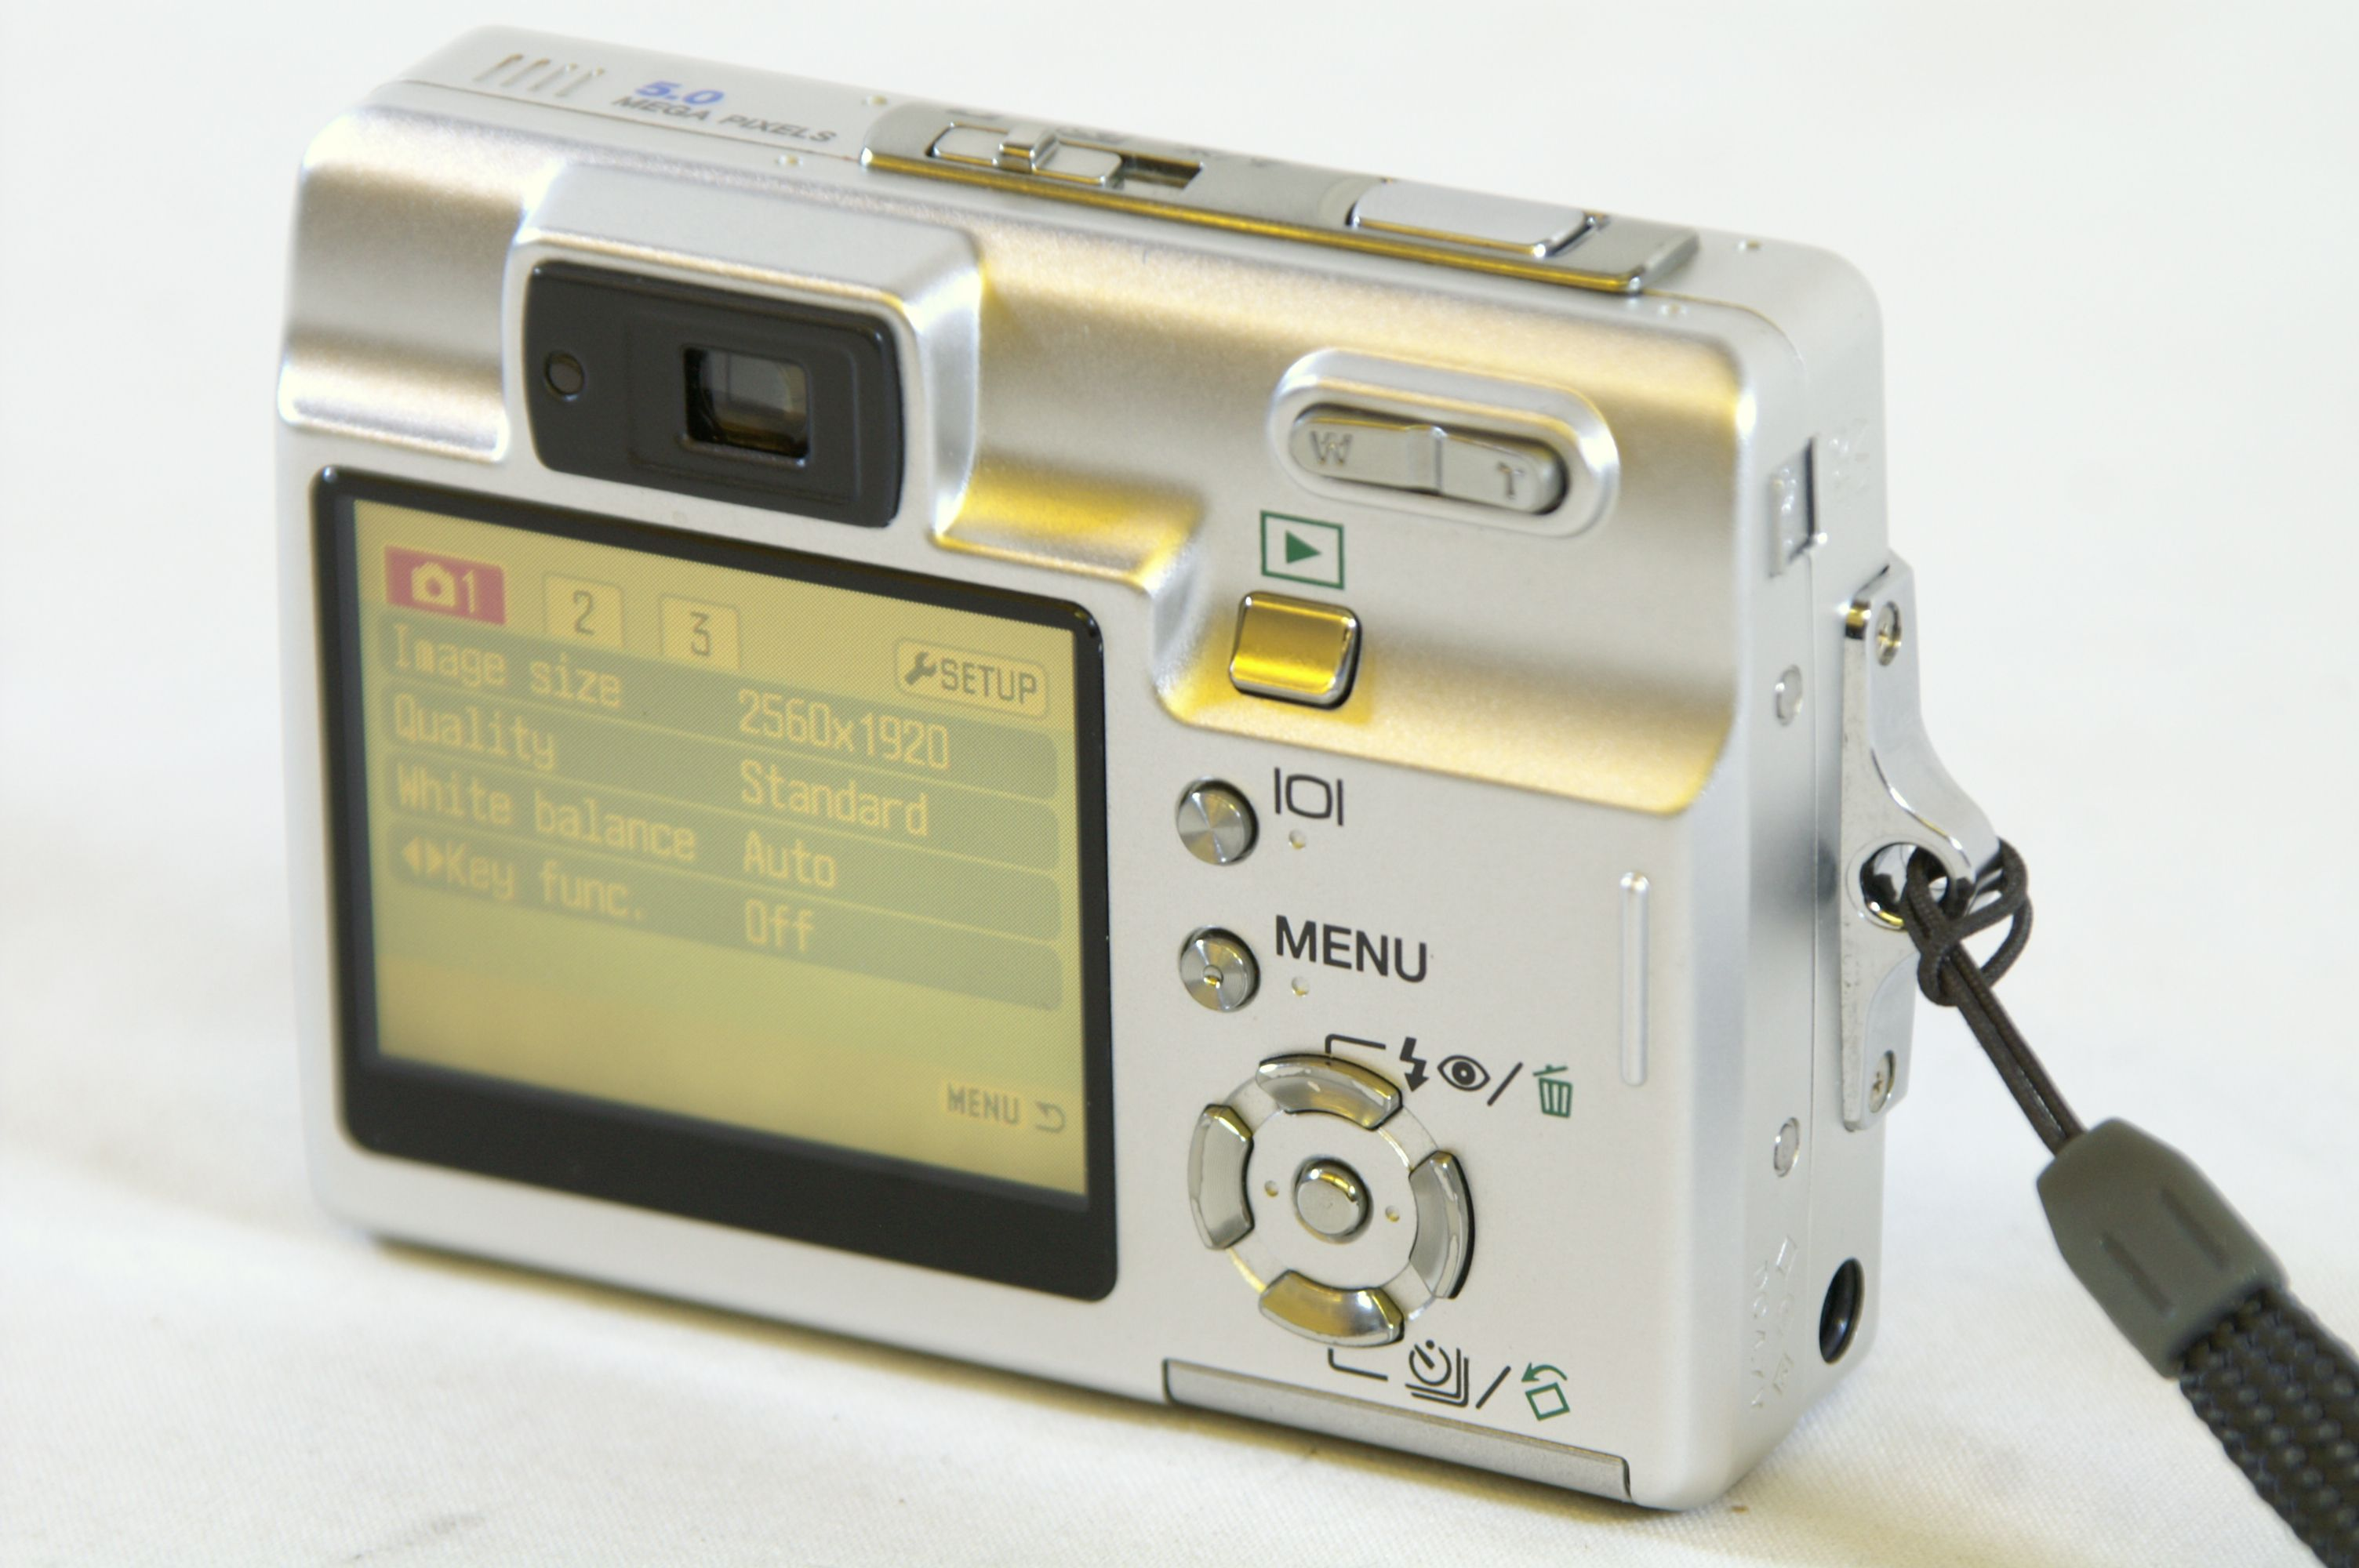 Konica Minolta Dimage X50 5.0MP Digital Camera with SD Card Bundle 5. Open  Full-Size Image